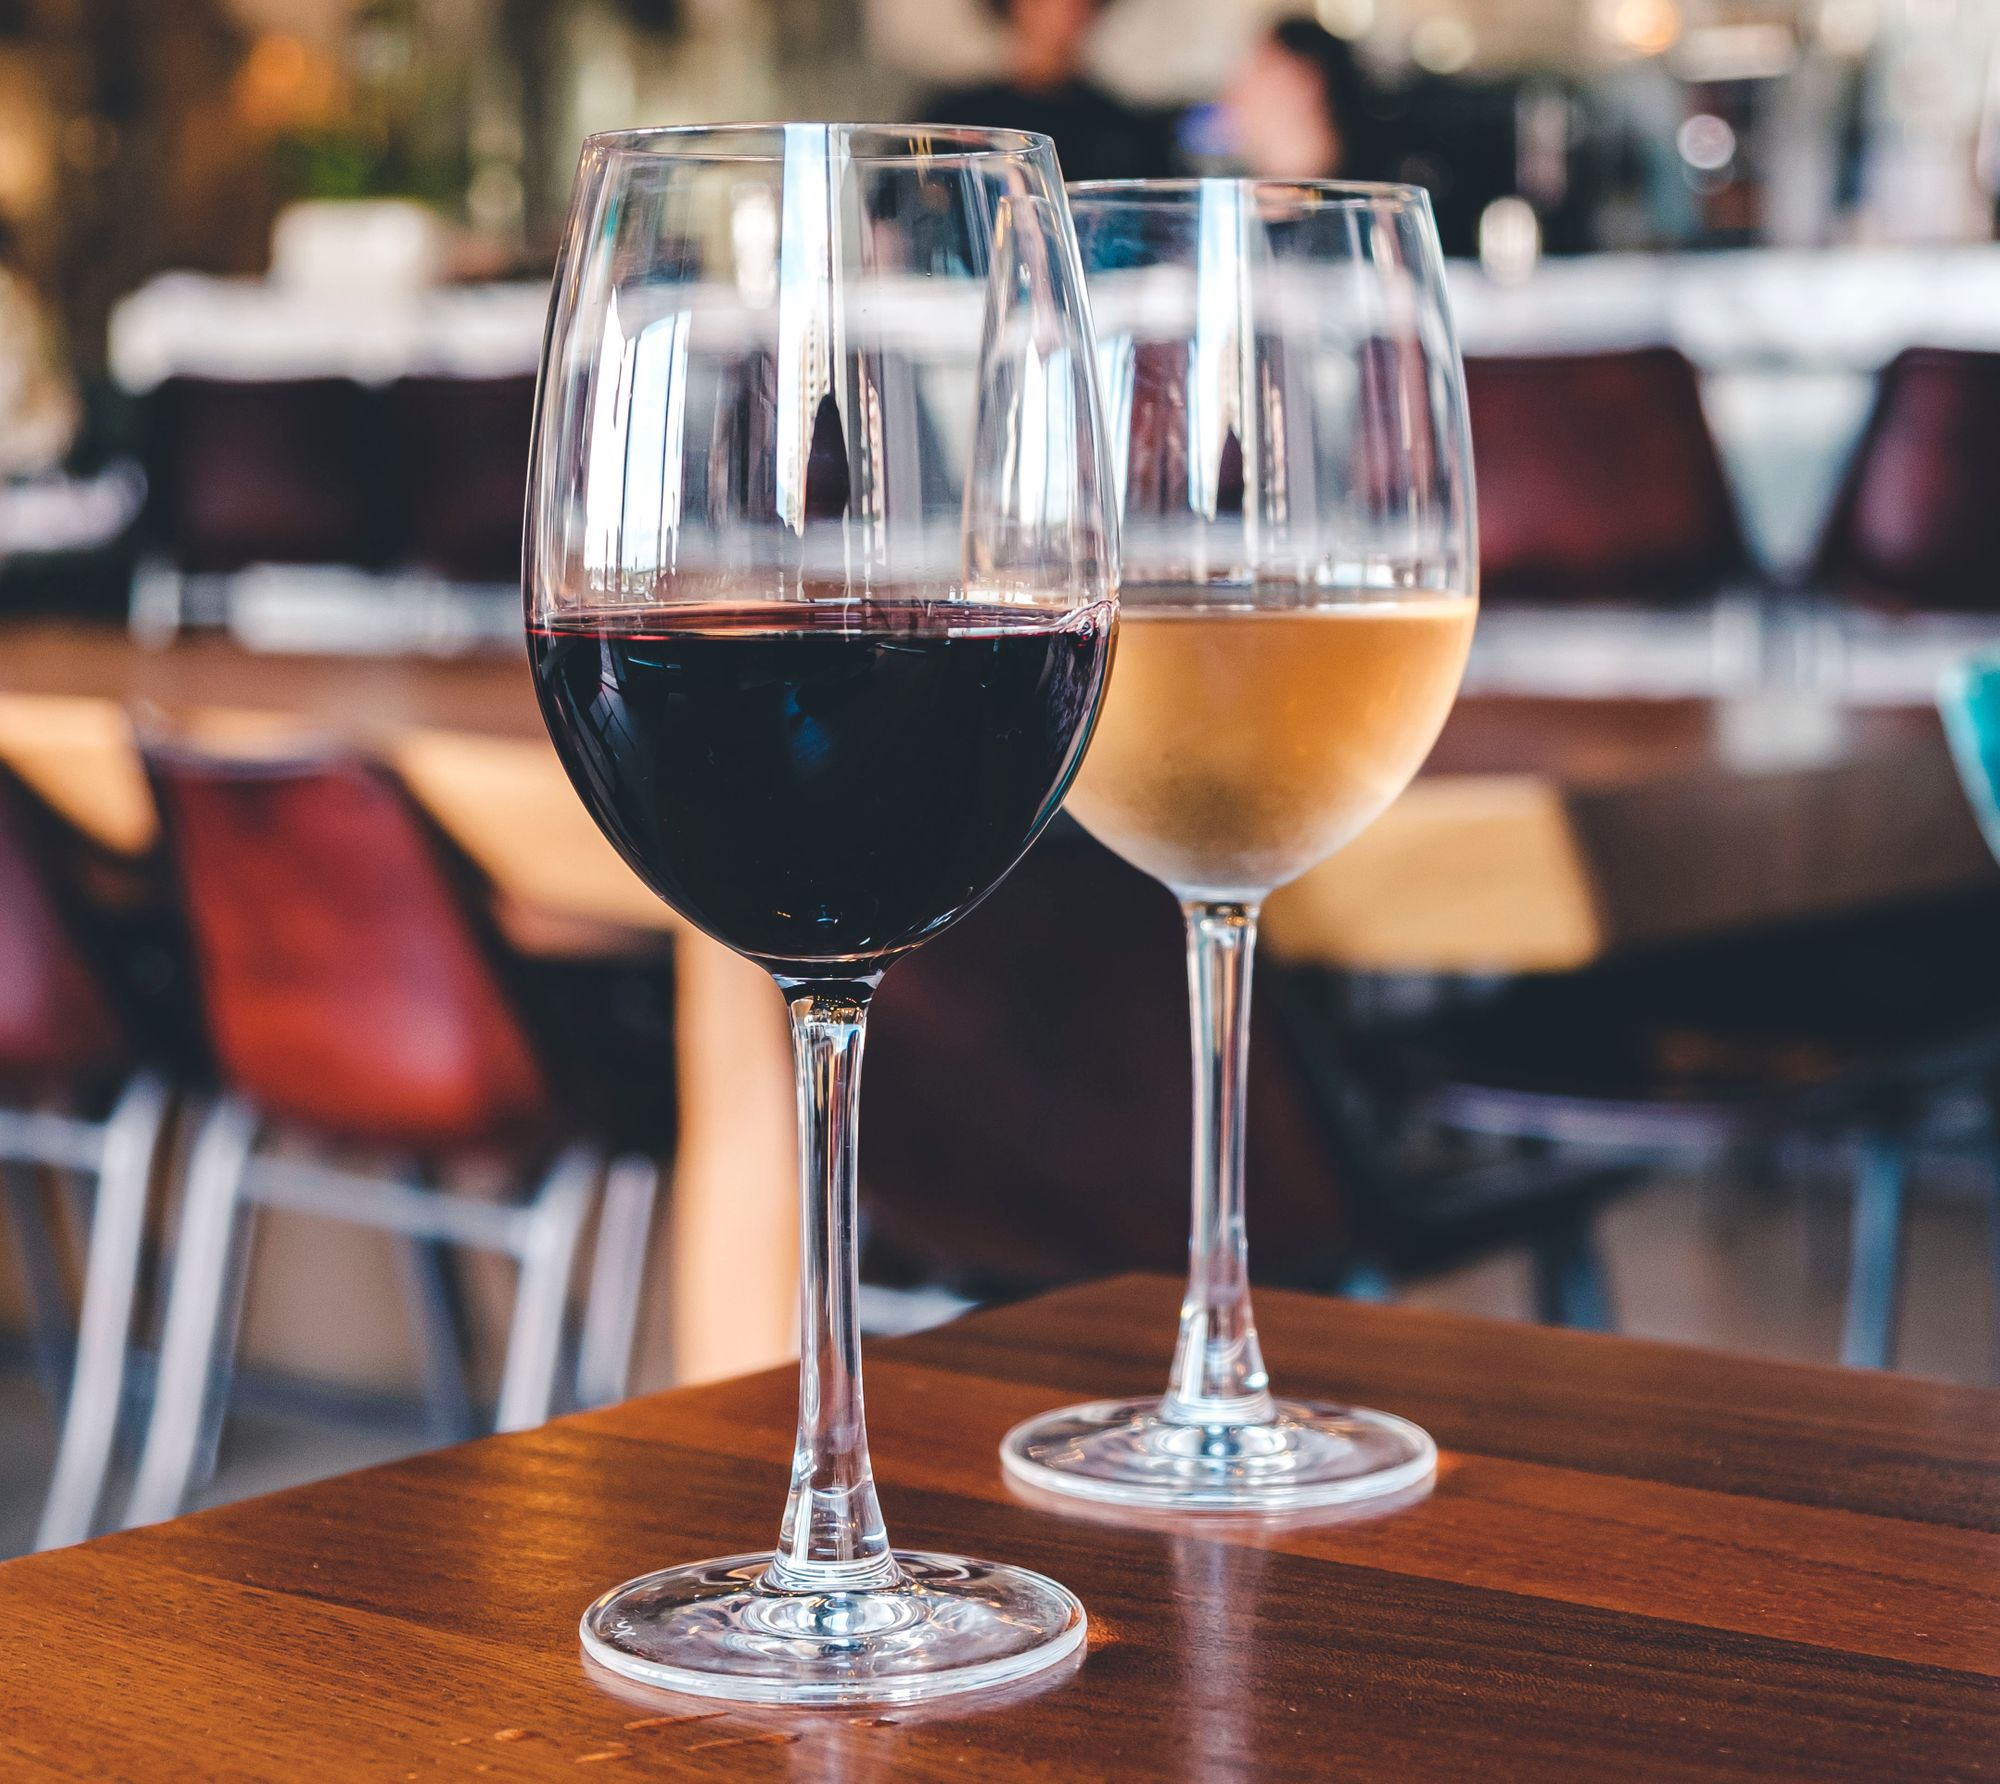 M8 Wine (Tempranillo in front)